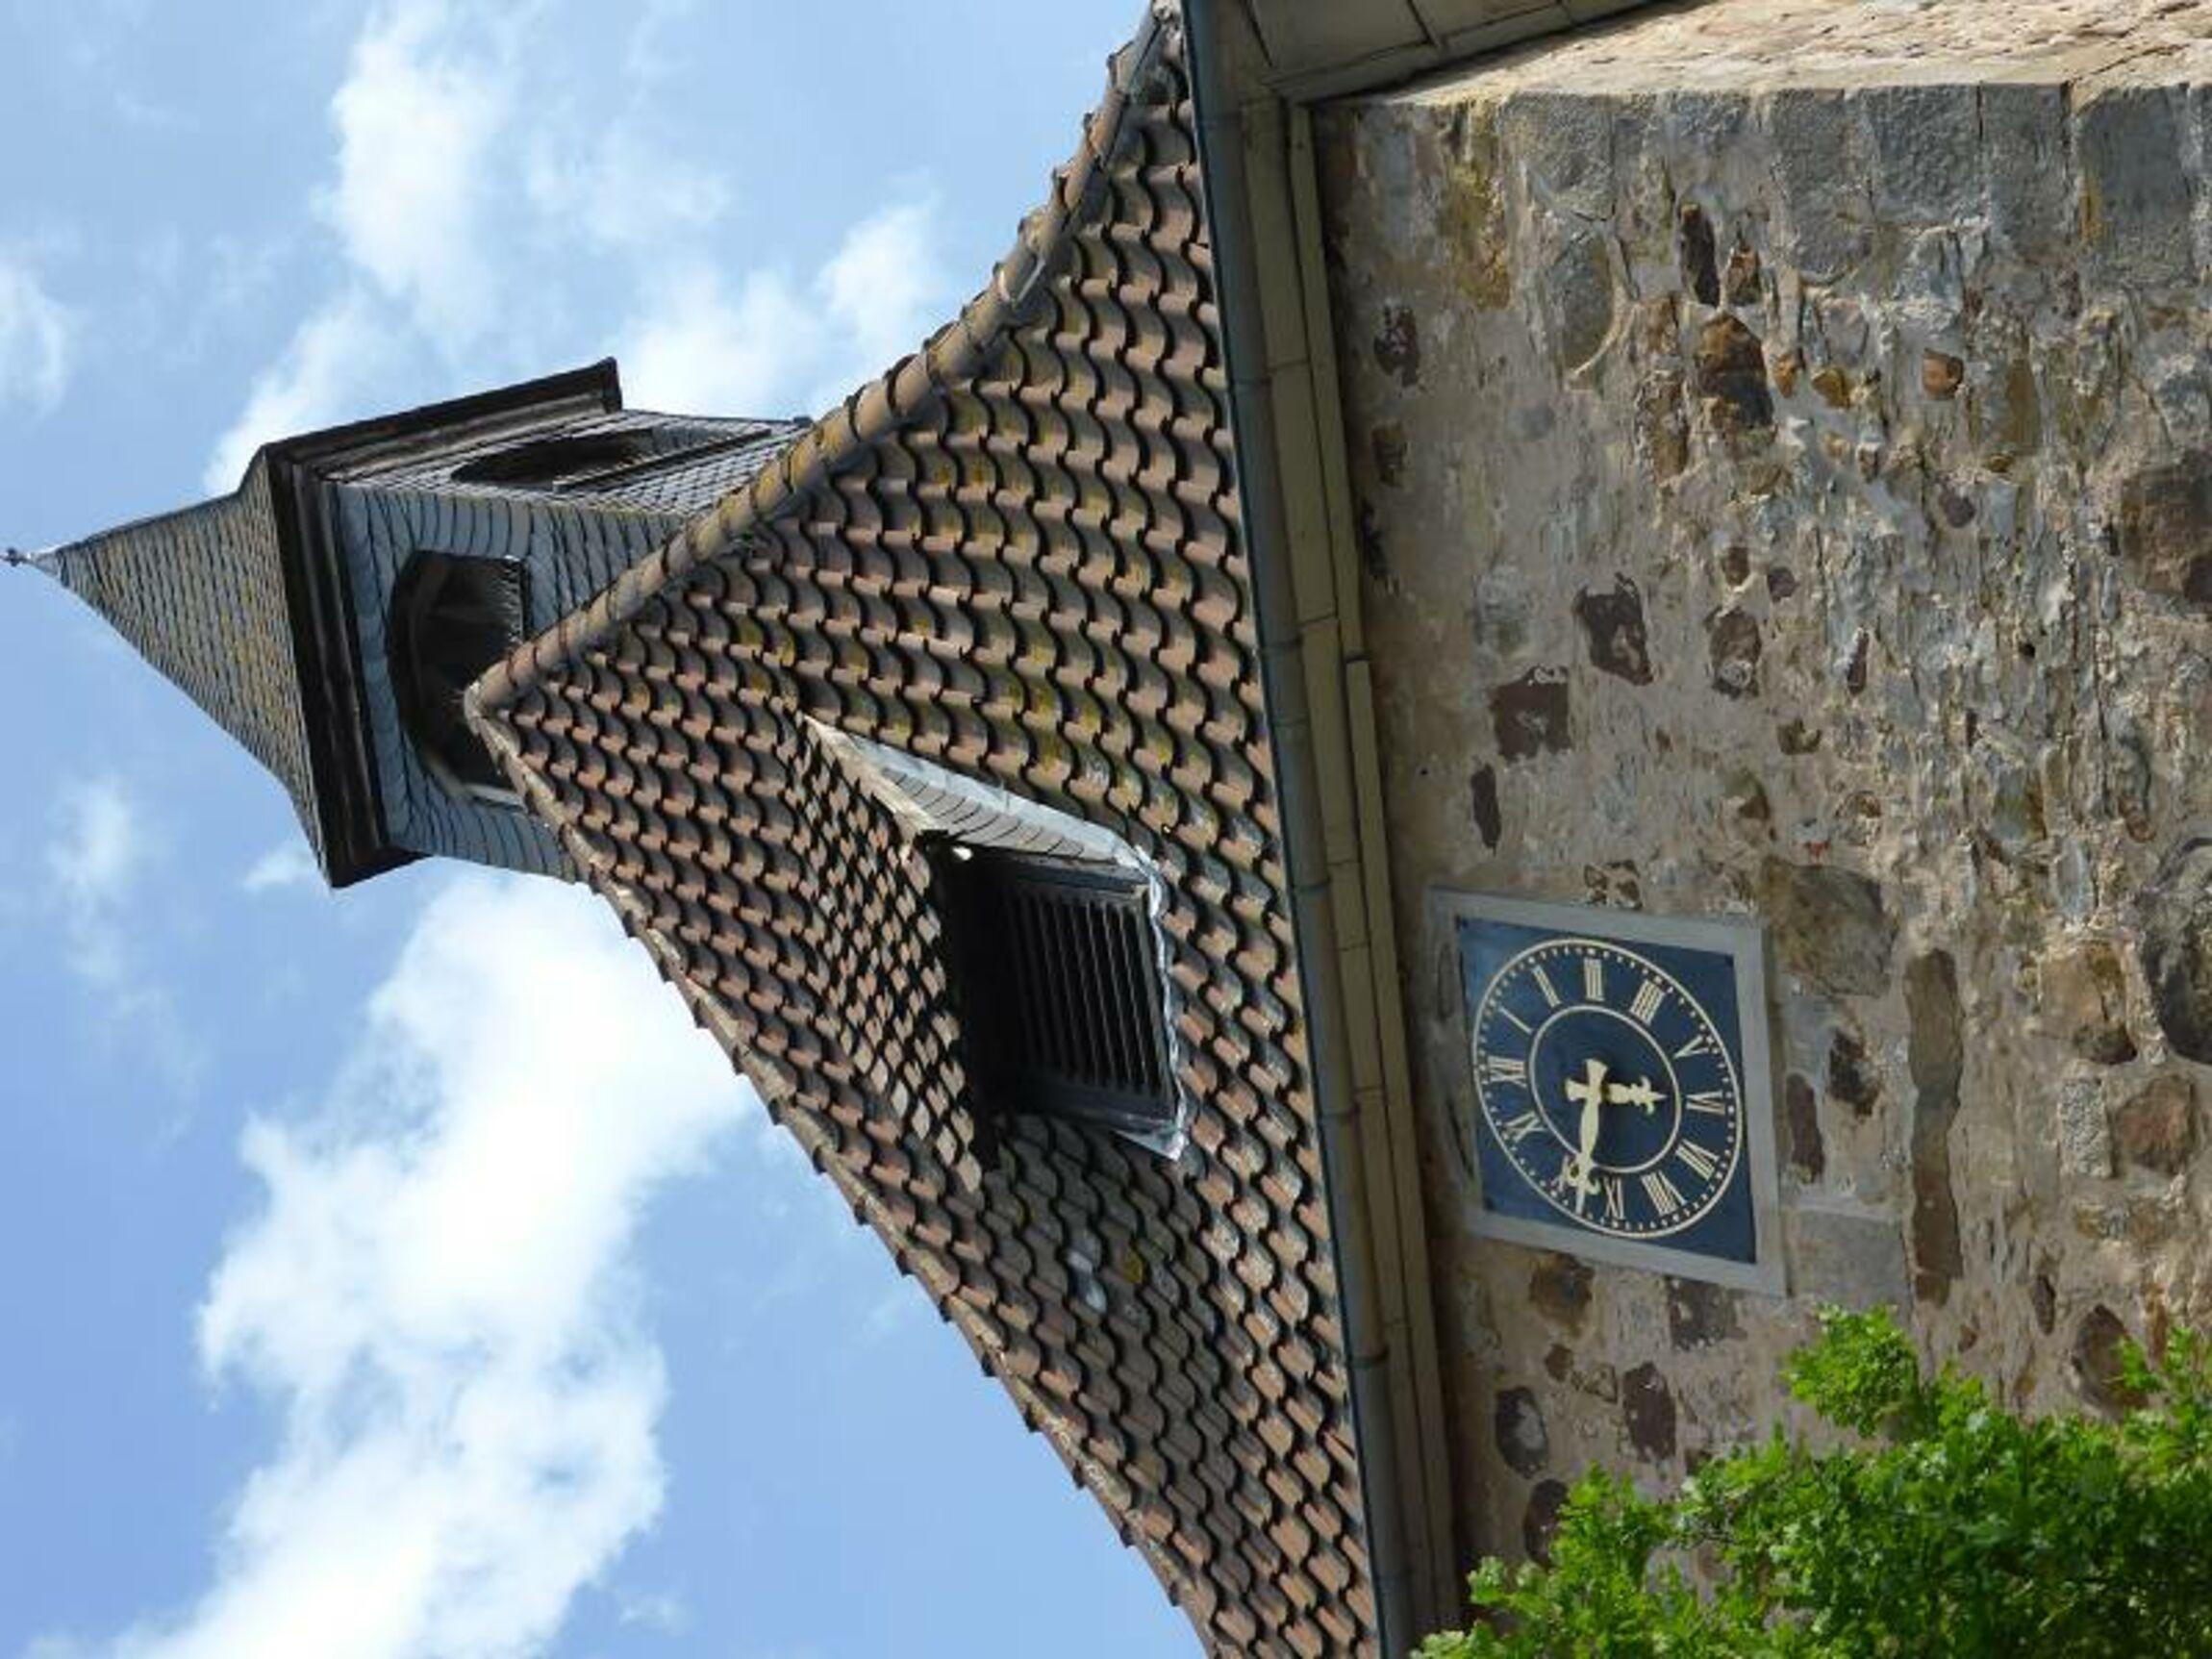 Turm & Uhr